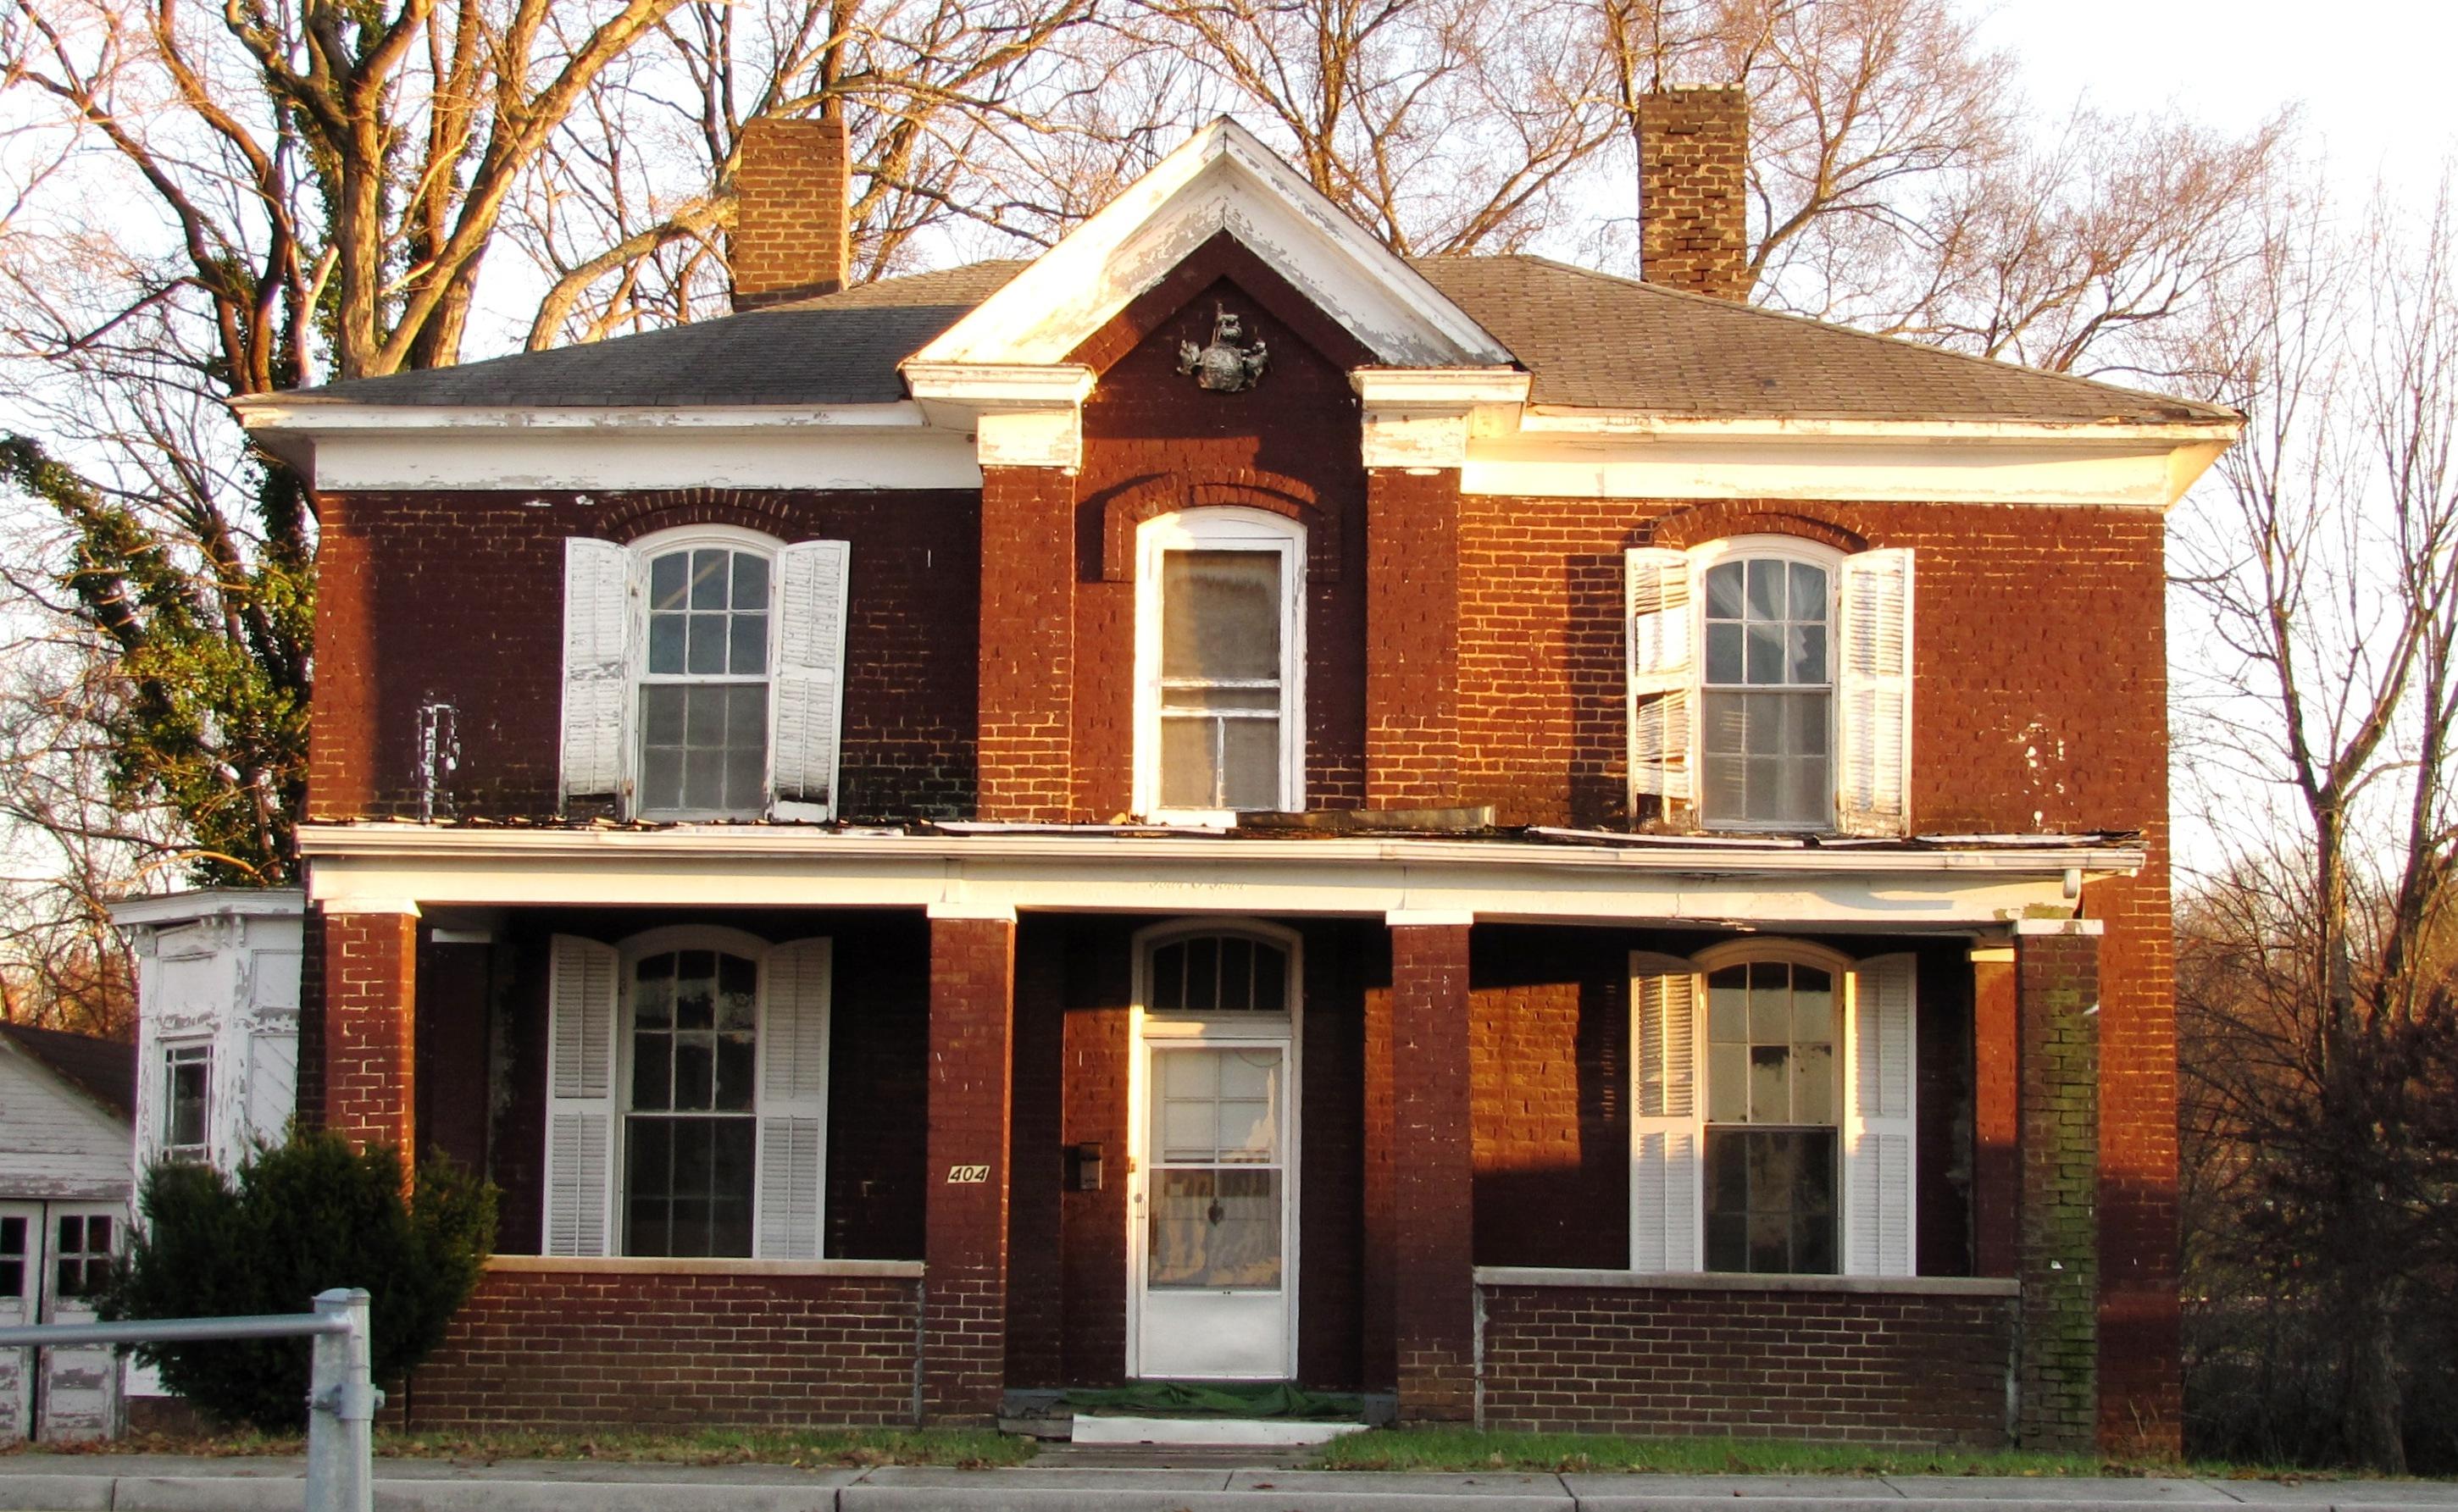 File:David-jones-house-high-tn1.jpg - Wikimedia Commons